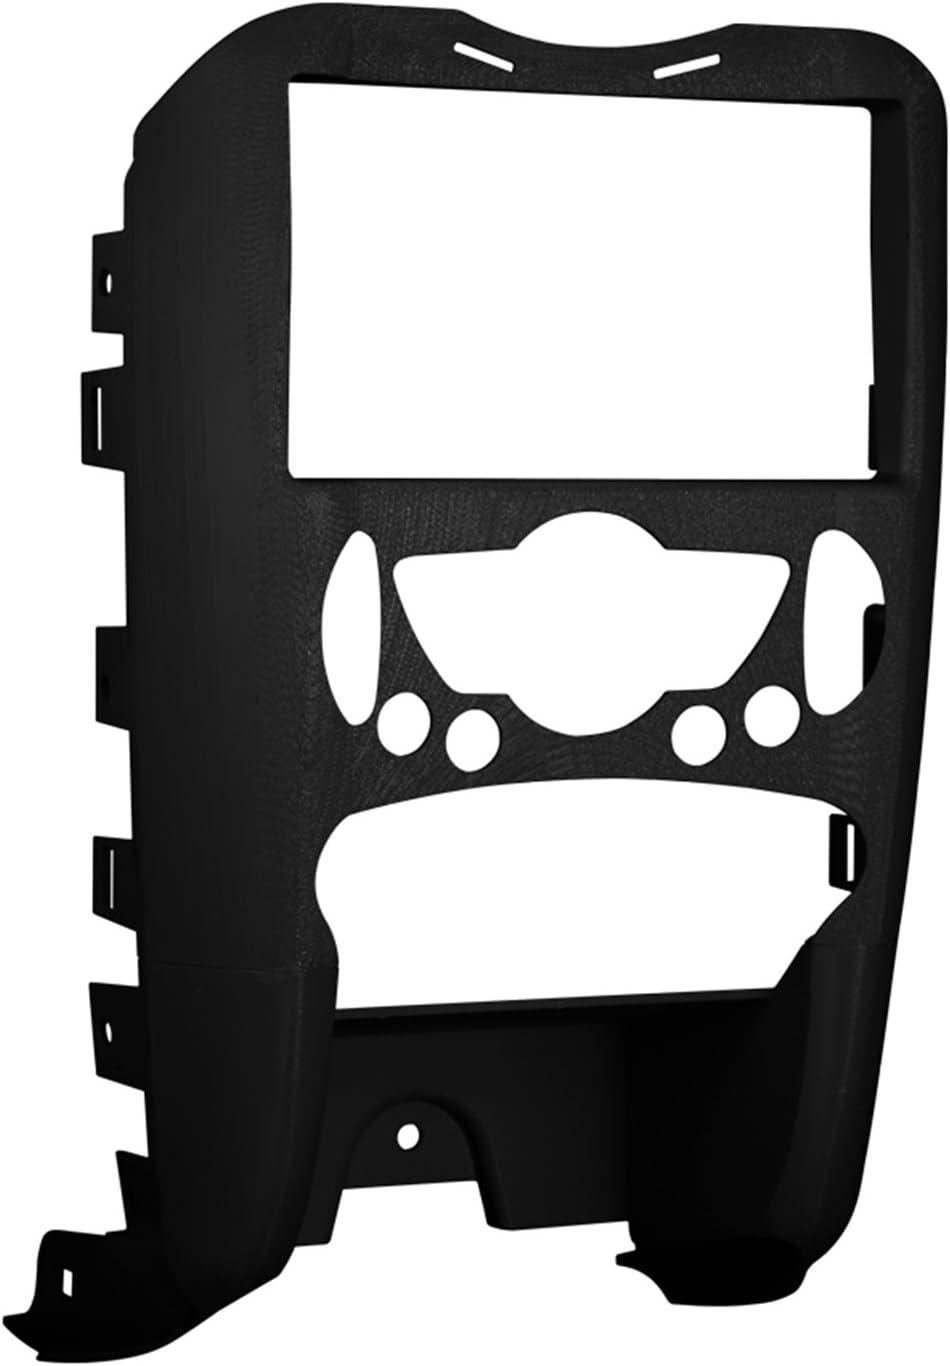 MINI COOPER CAR STEREO SINGLE//DOUBLE//2//D-DIN RADIO INSTALL DASH KIT 99-9309